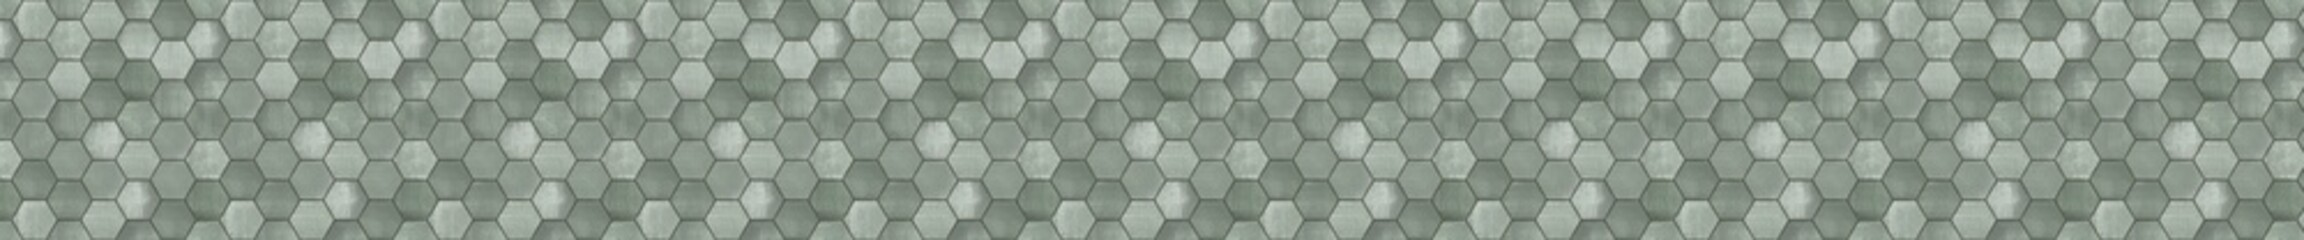 Monochrome Mosaic Tiled Website Head